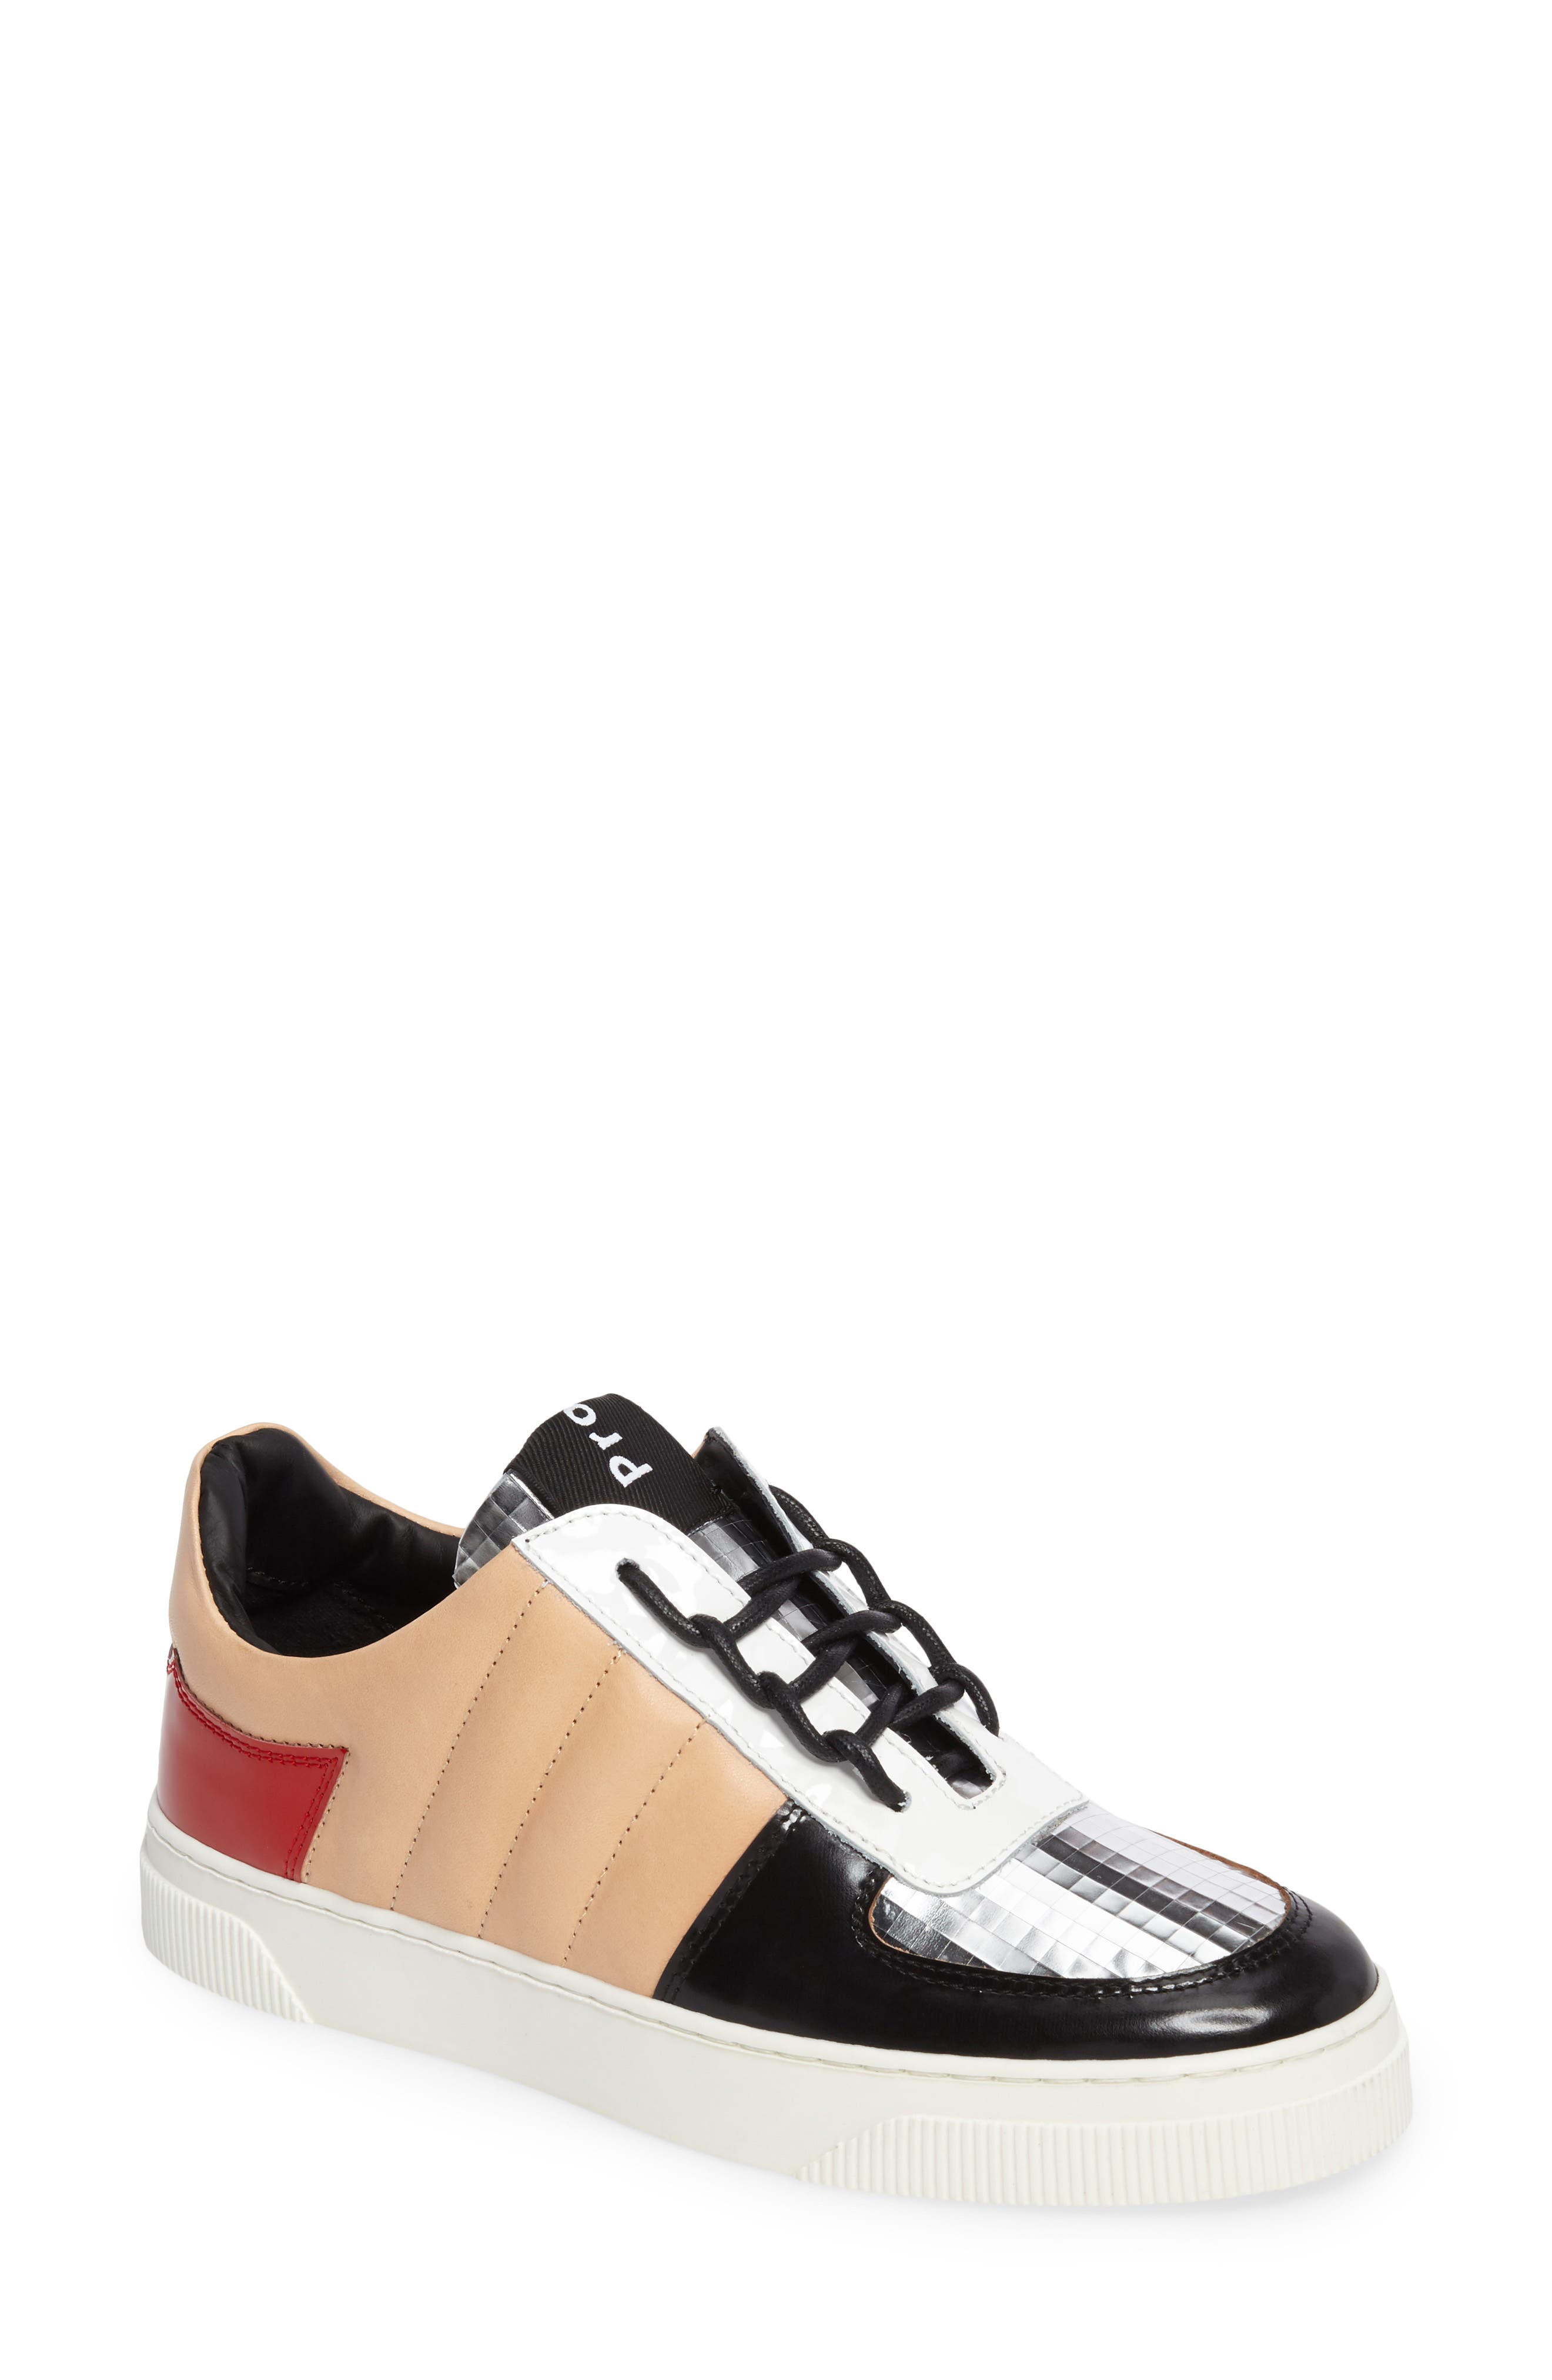 Proenza Schouler Sneaker (Women)